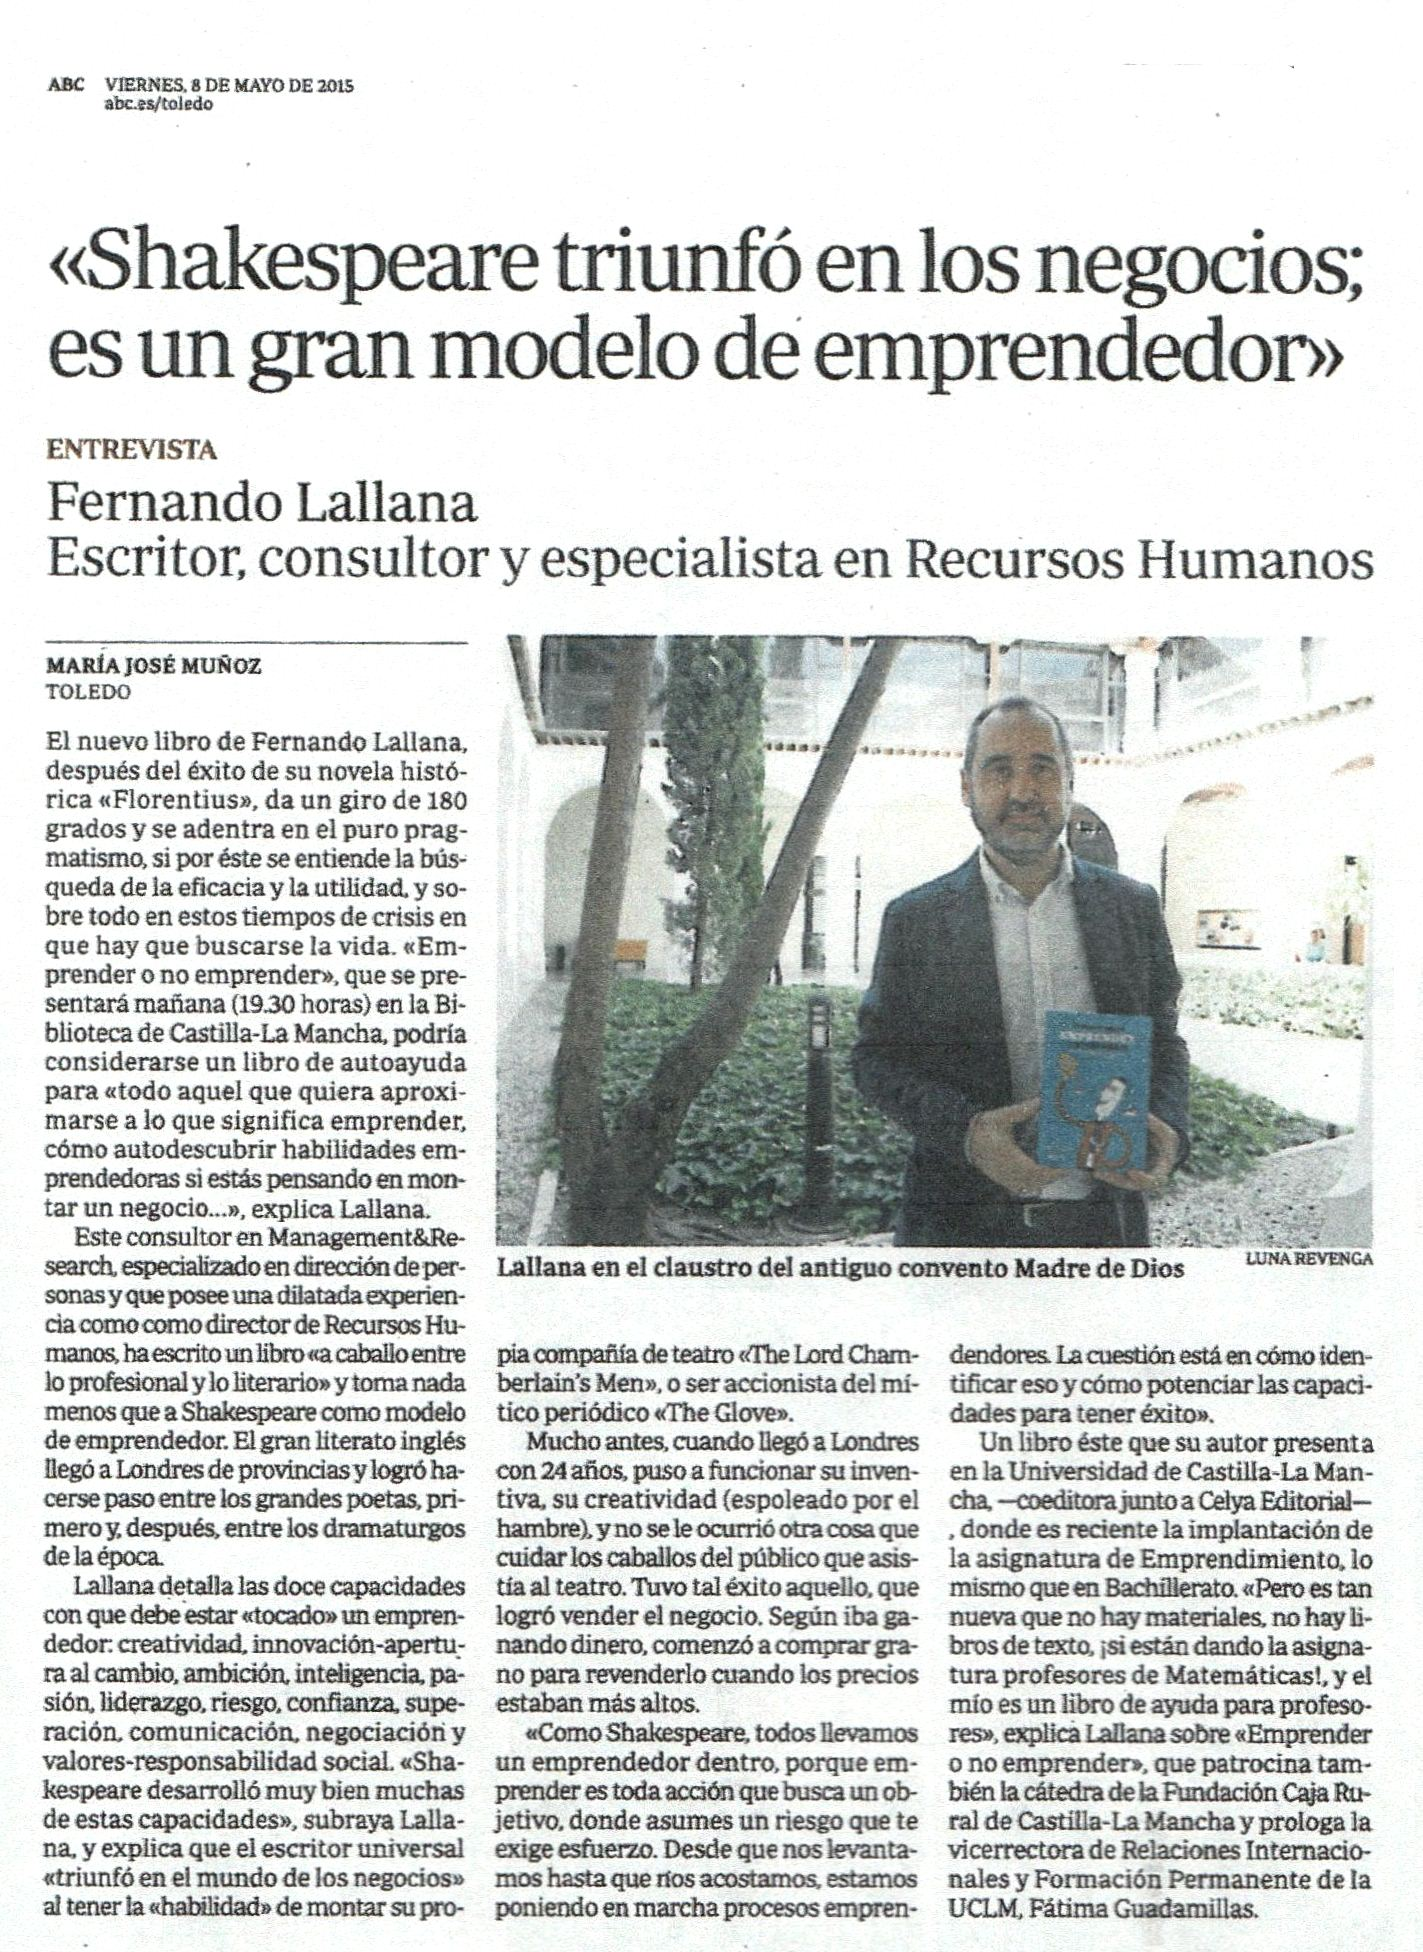 ABC : Emprender o no emprender, por Mª José Muñoz